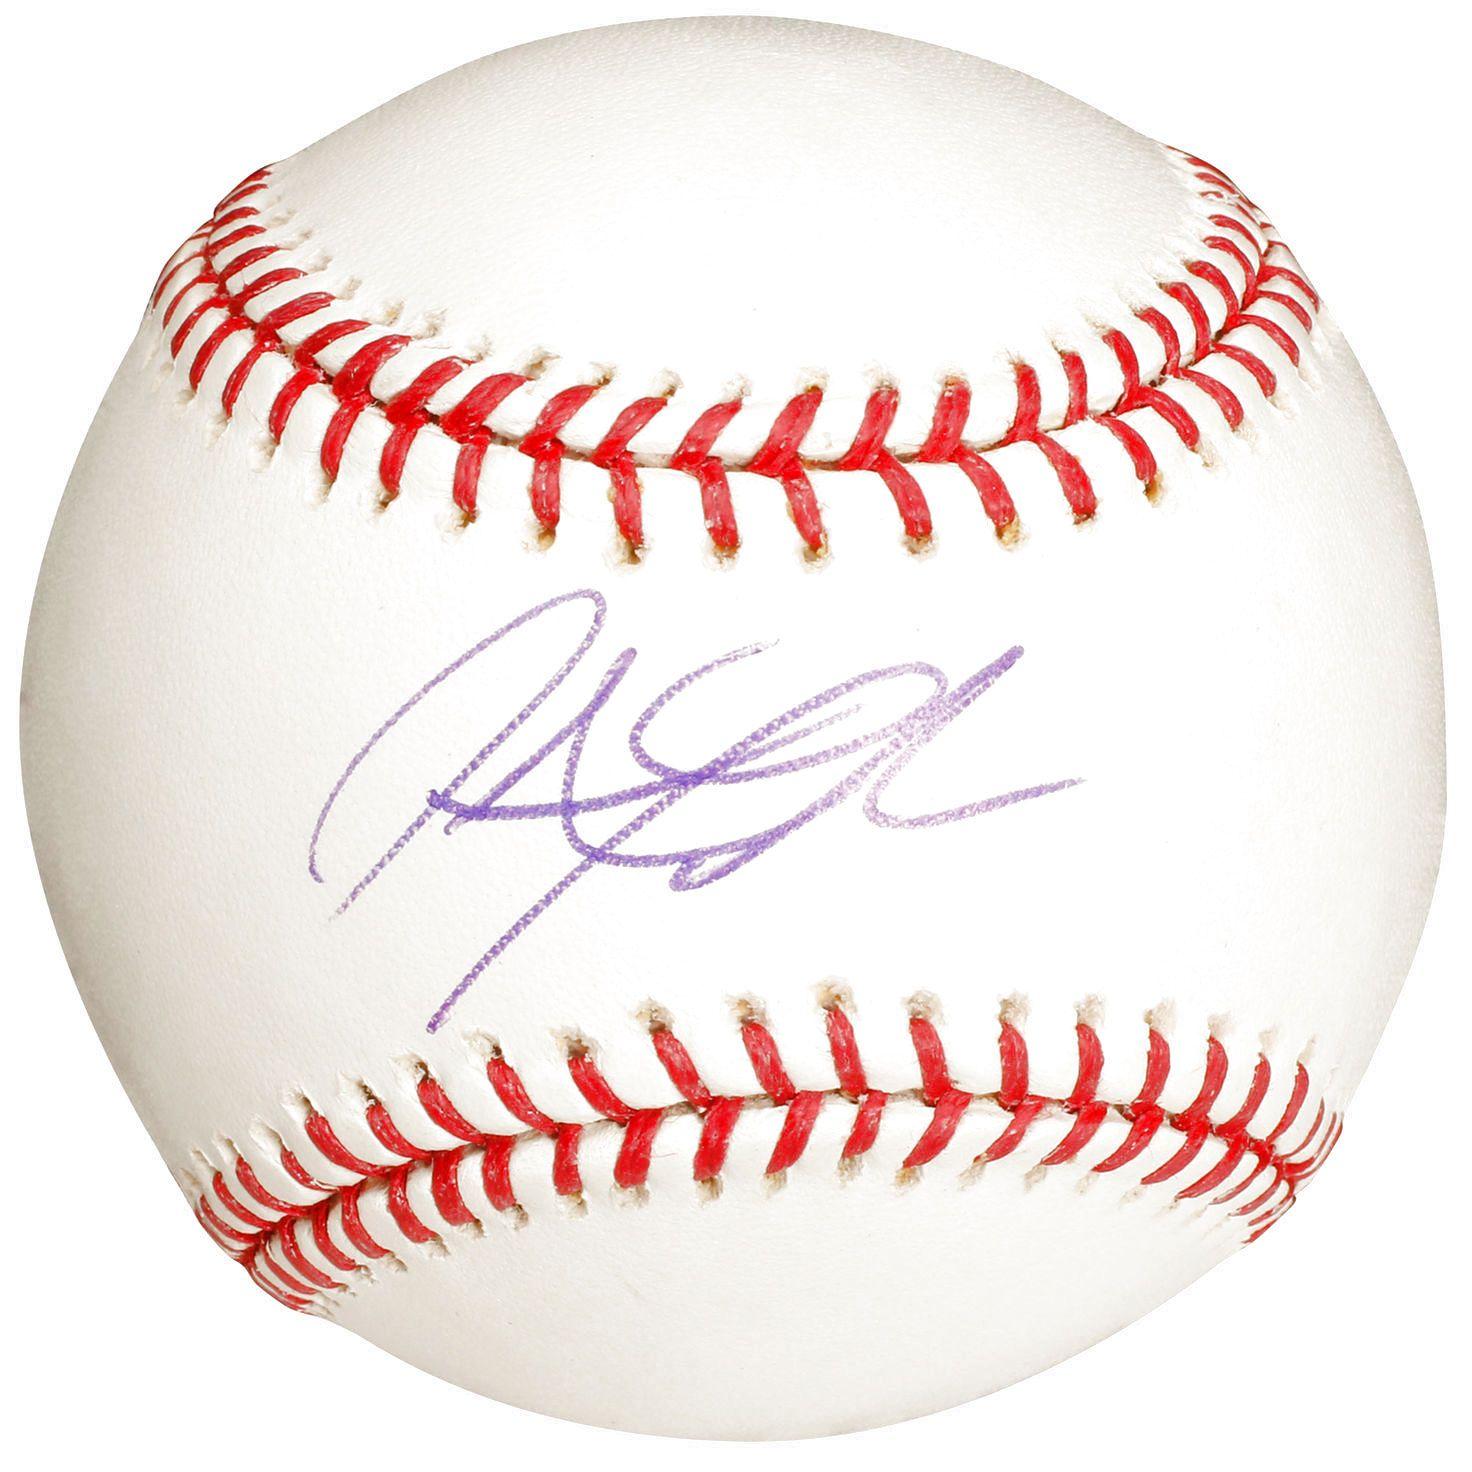 82192f4a9 Jonathan Papelbon Boston Red Sox Authentic Autographed Baseball ...